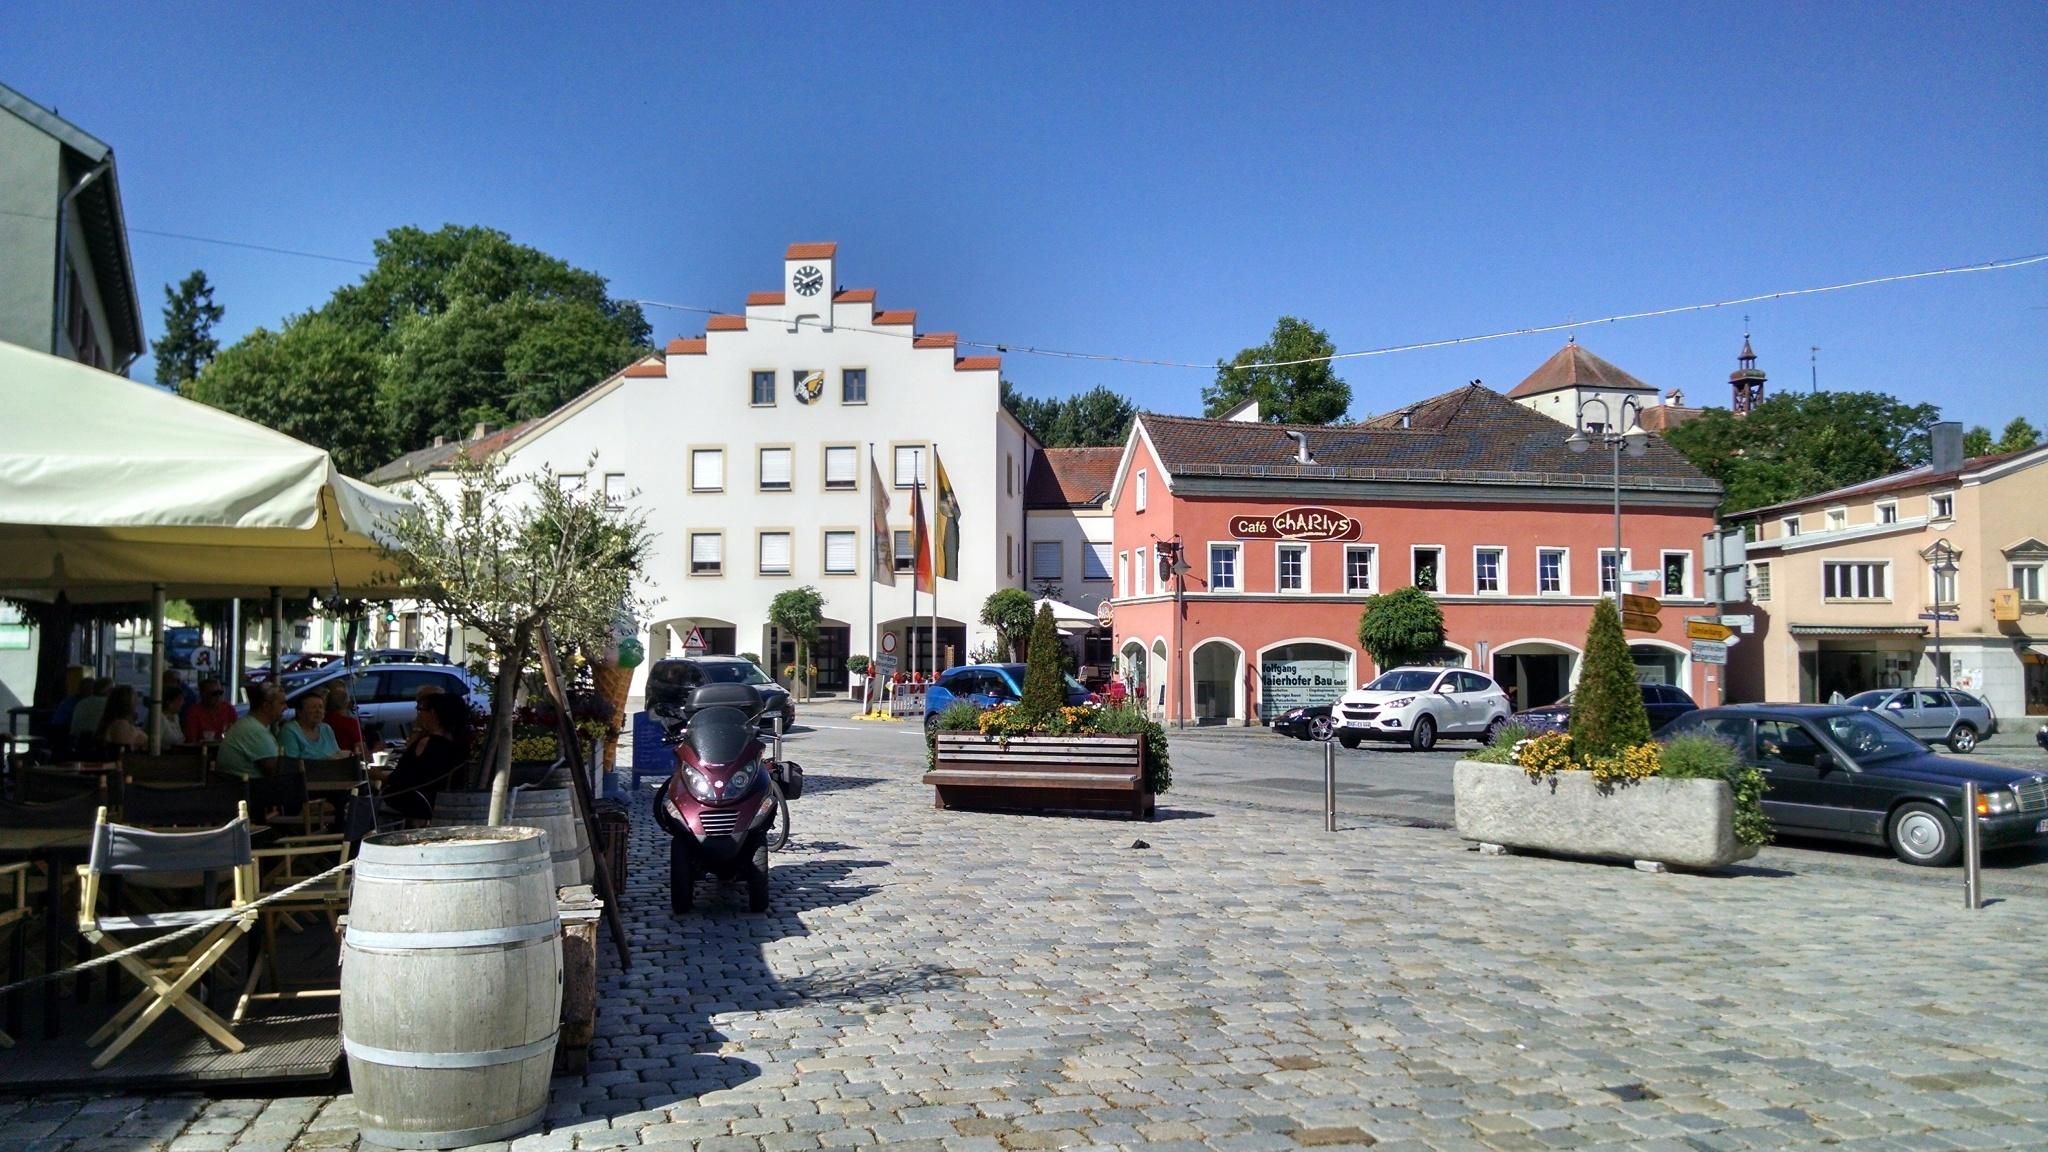 Kollbach